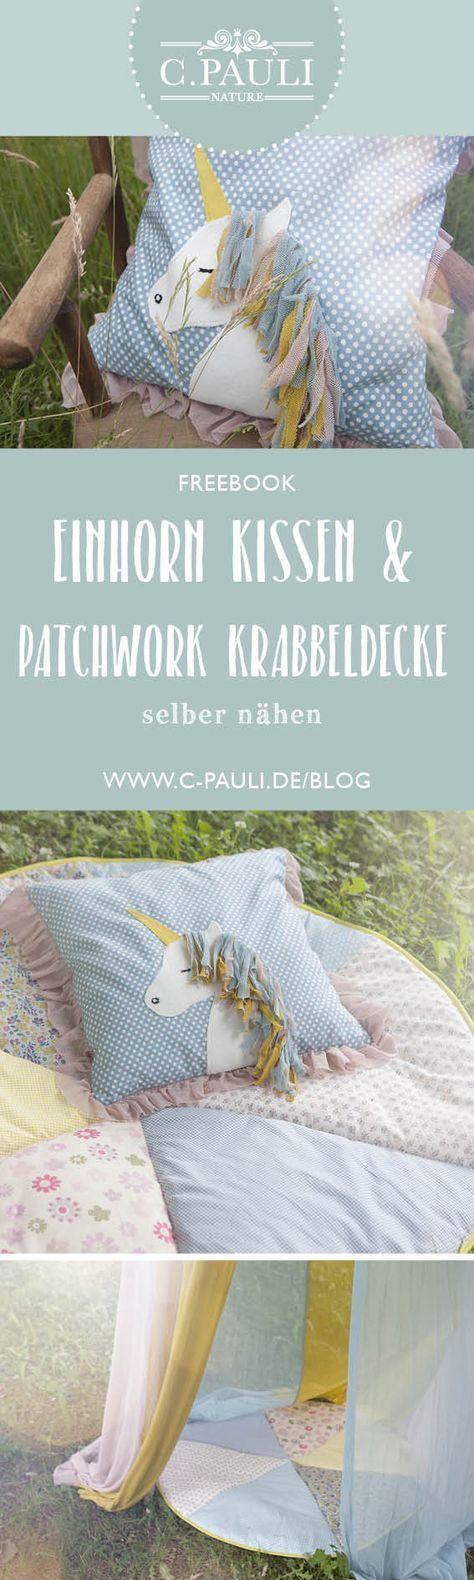 DIY Kissen Mit Einhorn Applikation / Organic Cotton | C.Pauli Nature Blog